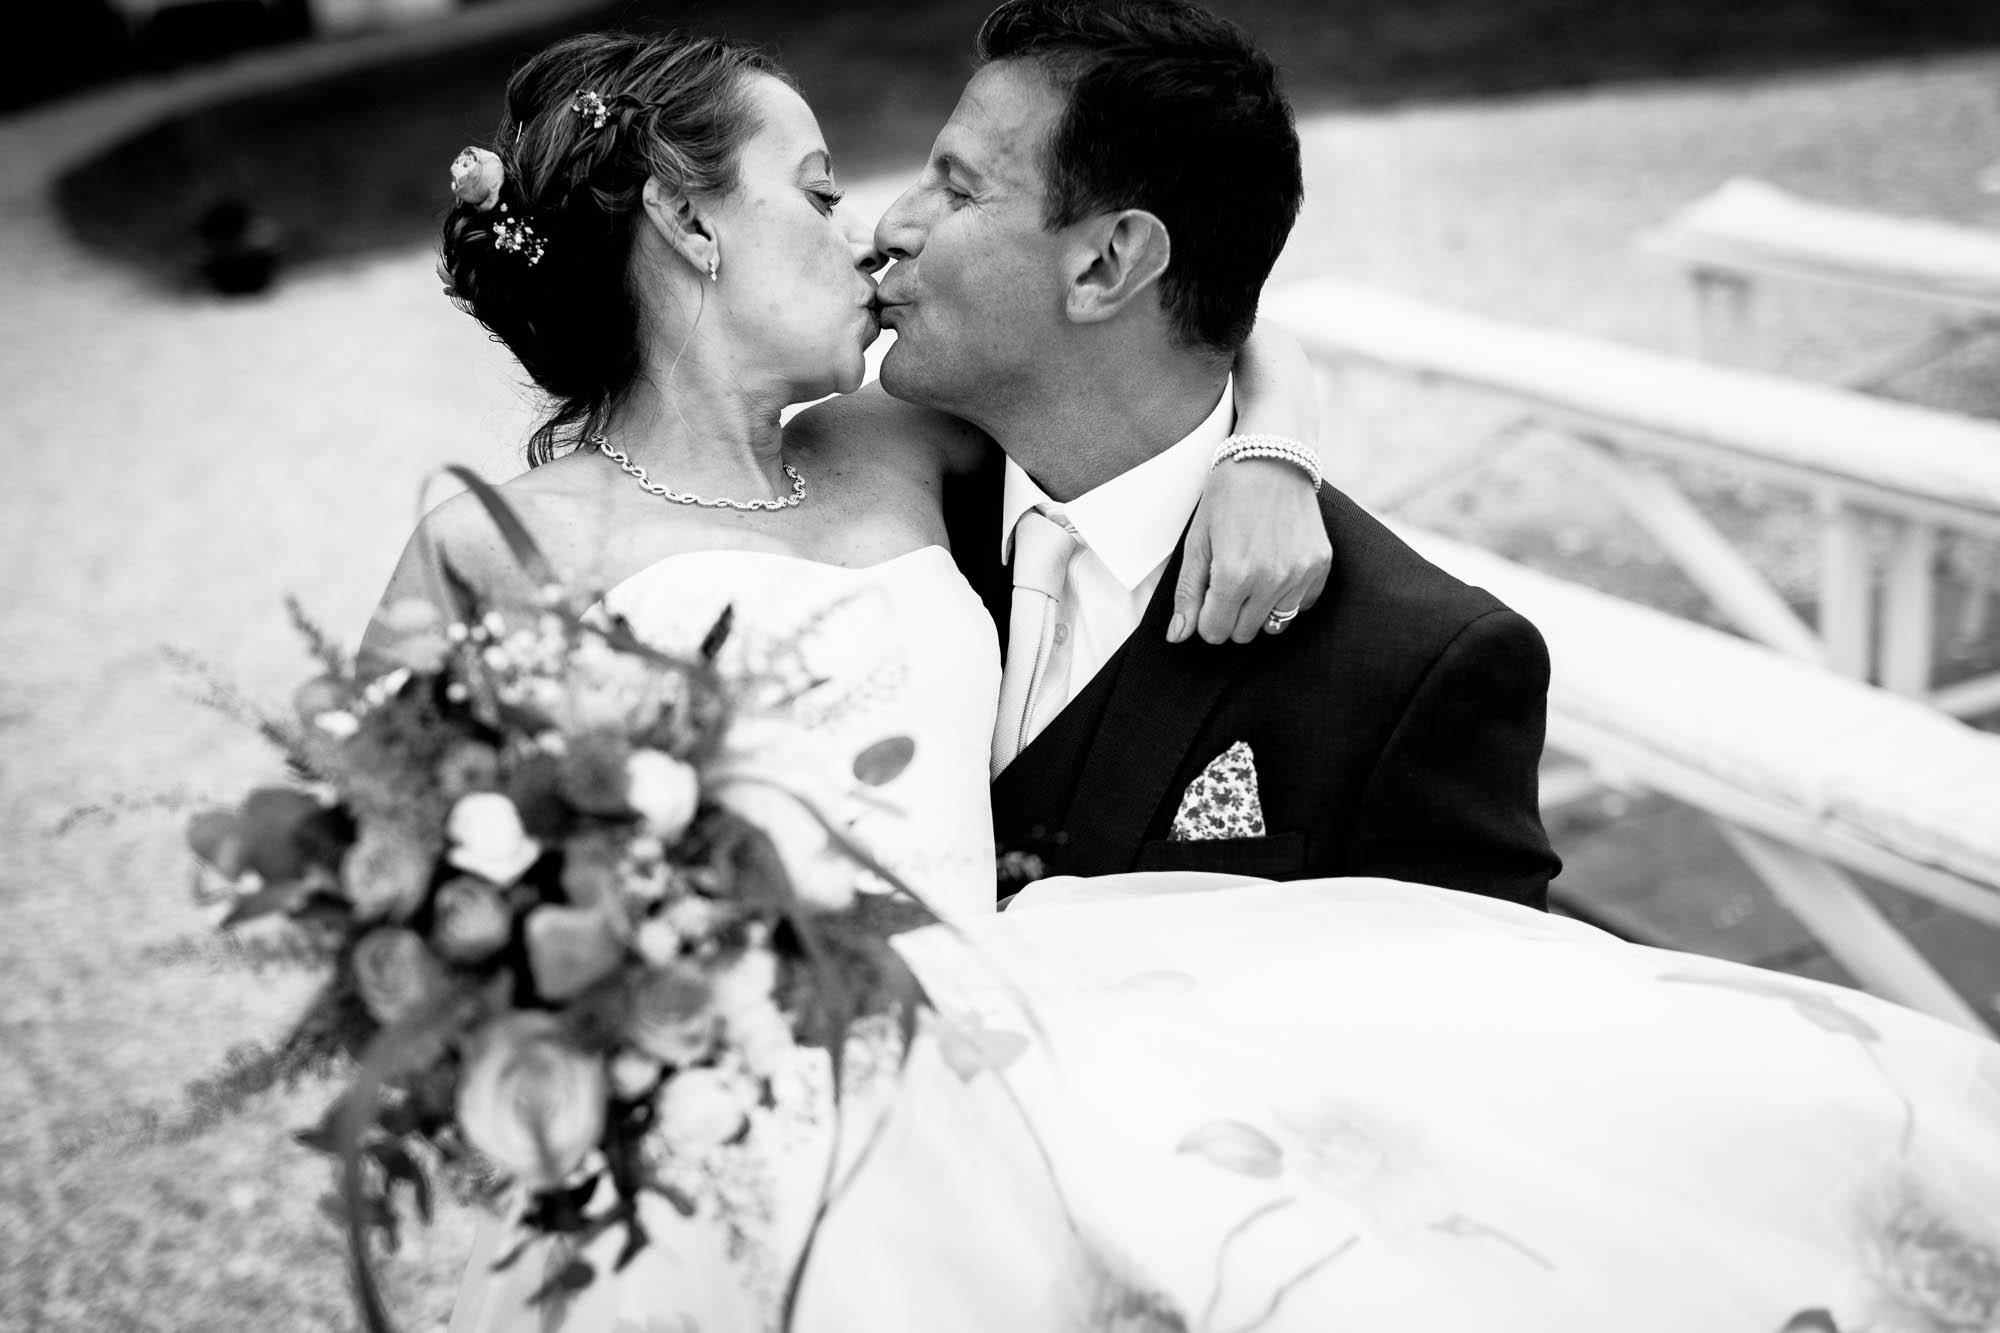 Lythe Hill Hotel Wedding Photography - Gavin and Fiona 18